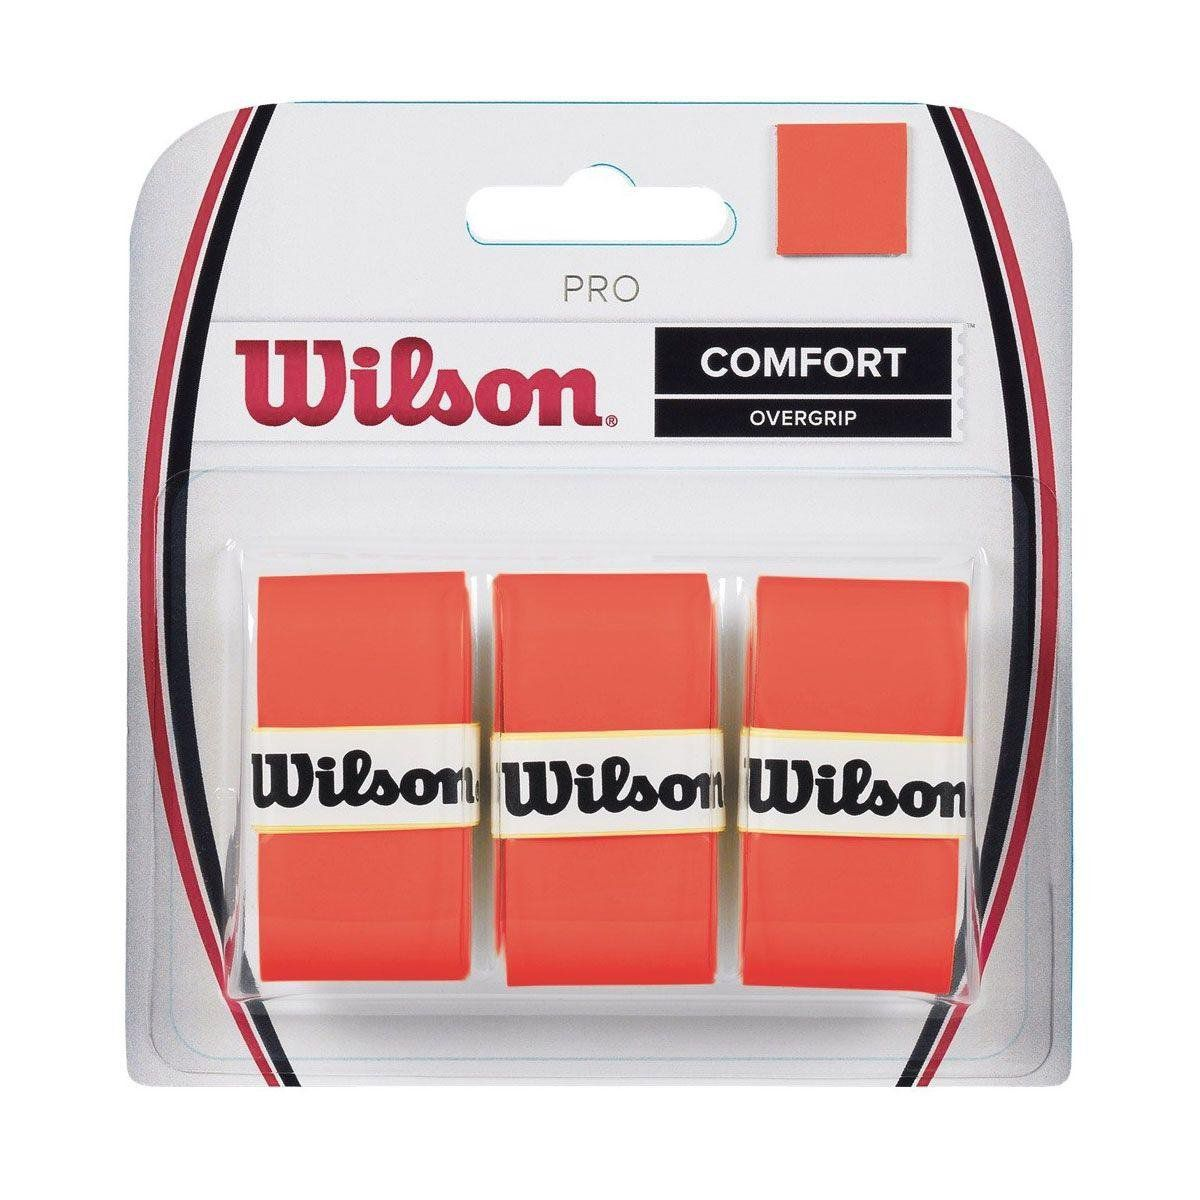 Overgrip Wilson Pro Comfort - Salmão escuro  - REAL ESPORTE